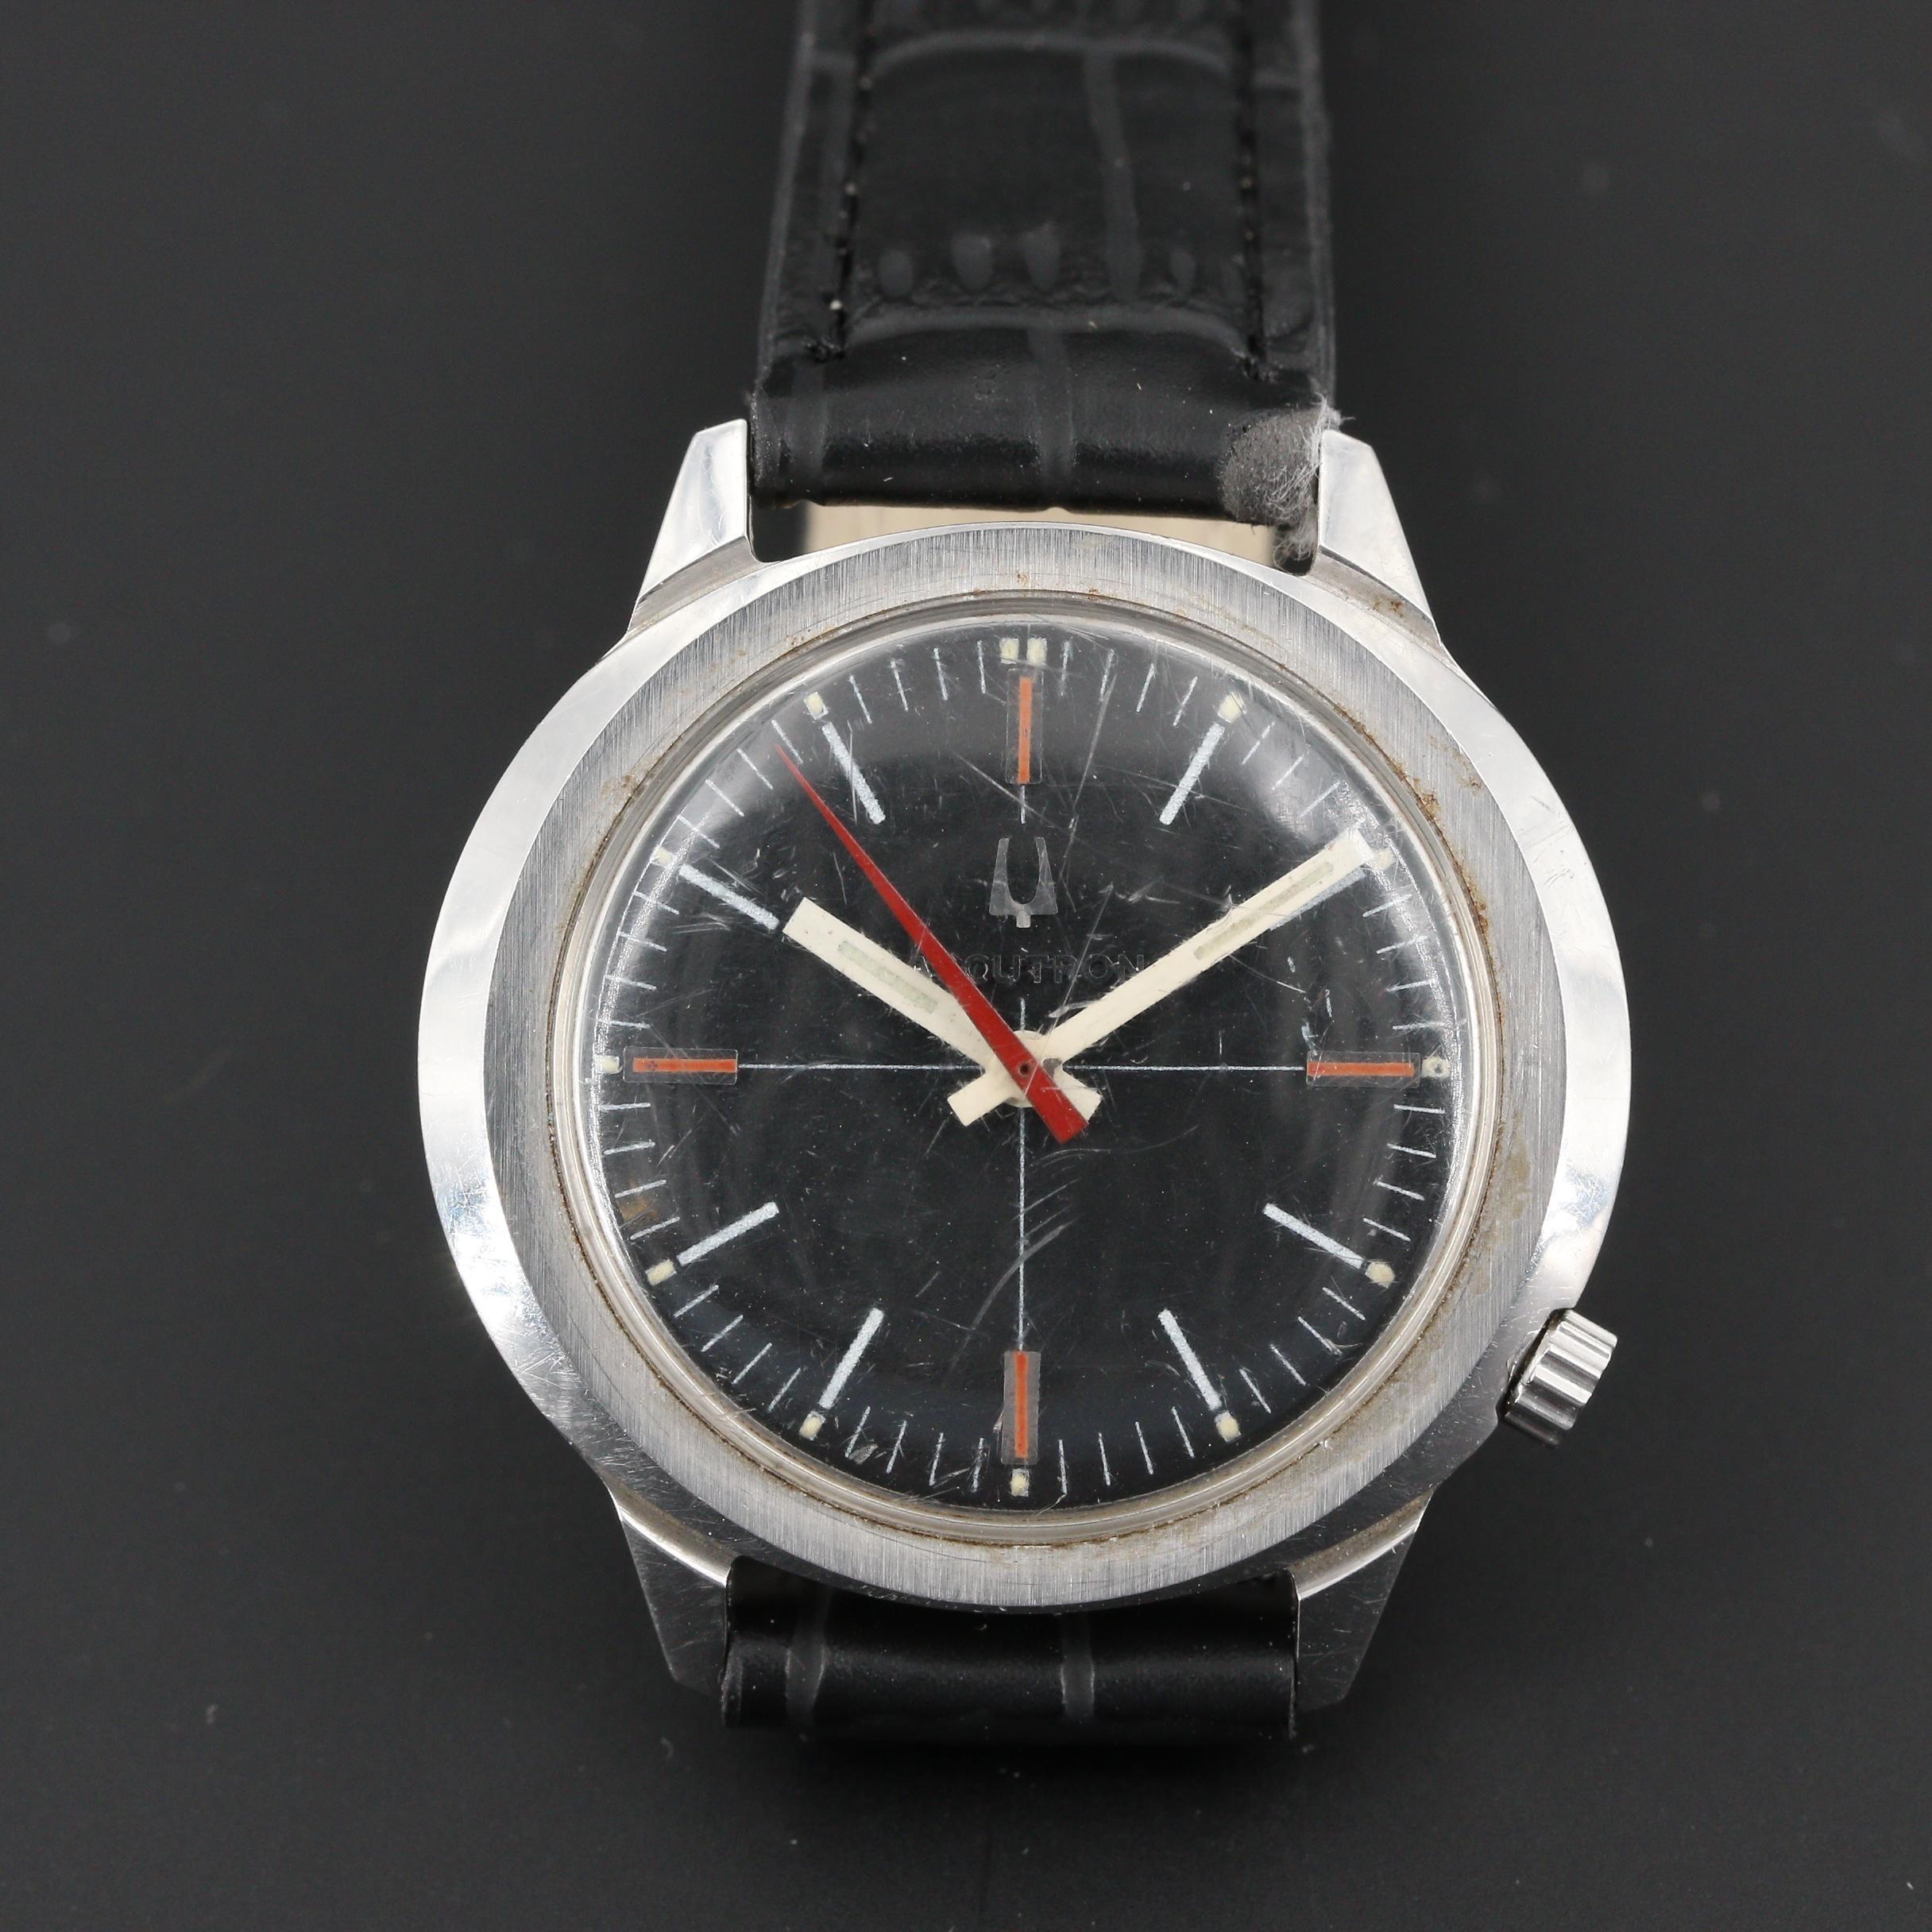 Bulova Accutron Stainless Steel Wristwatch, Circa 1970